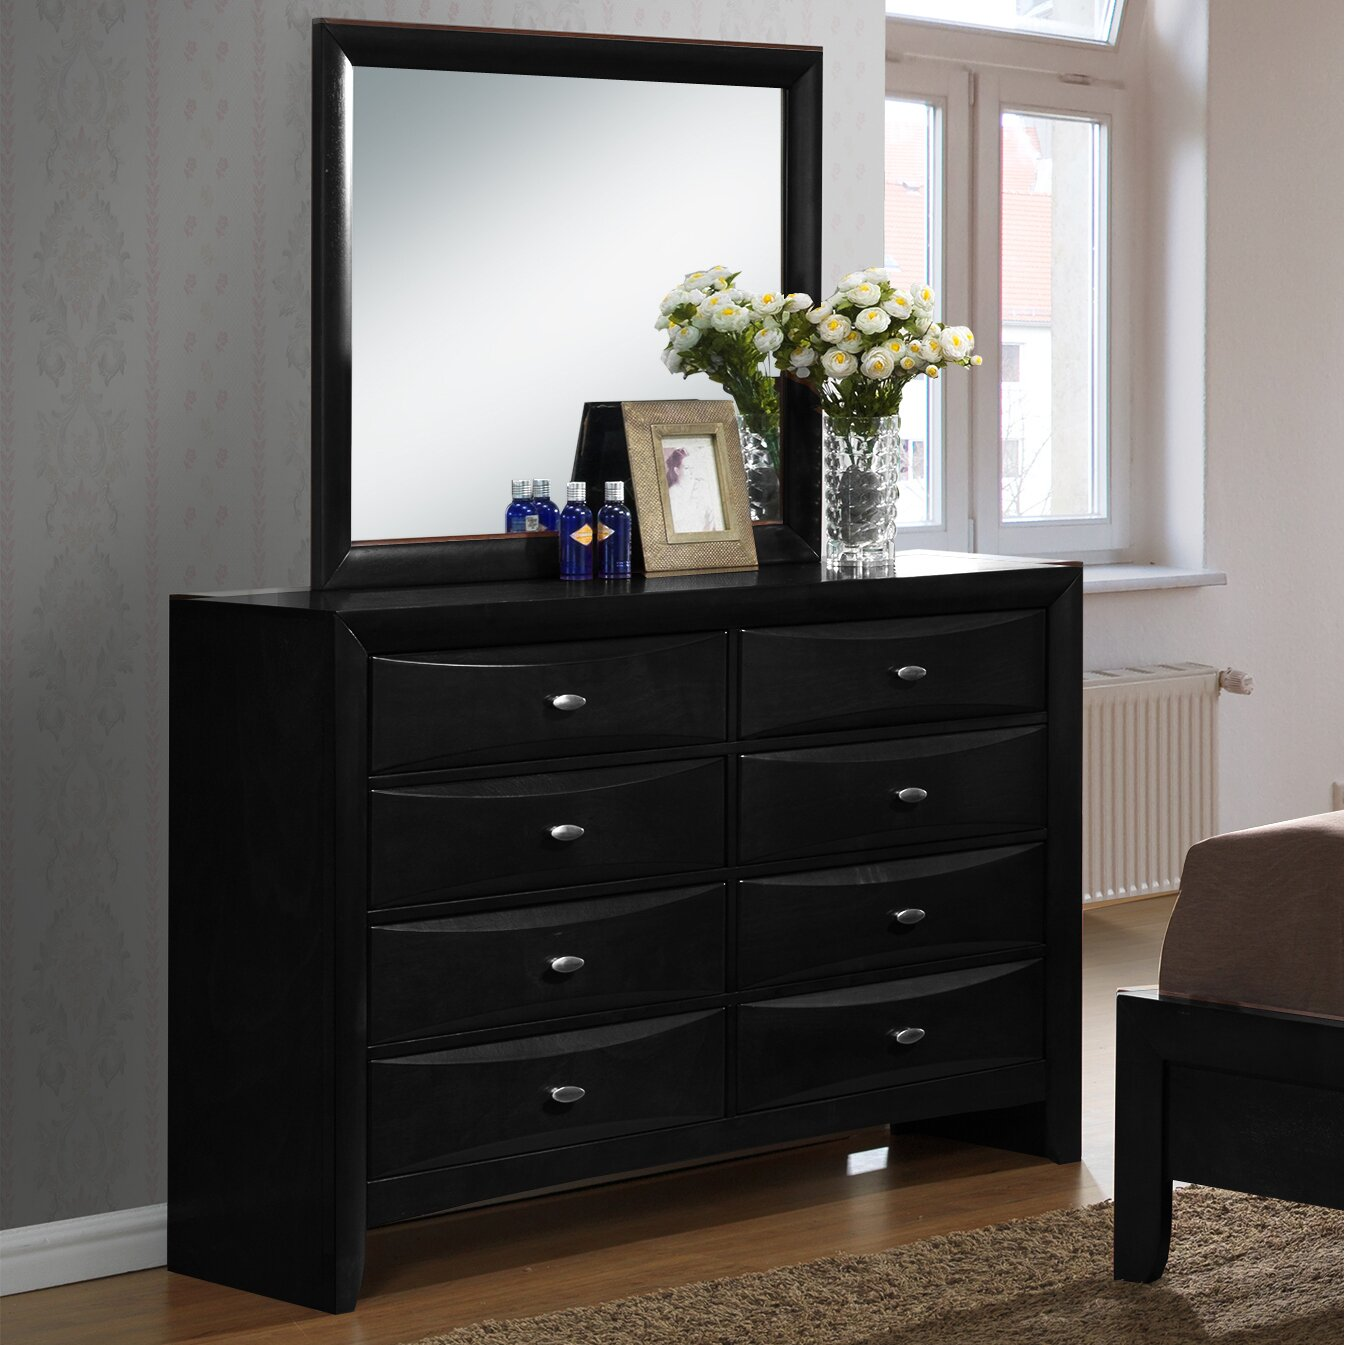 Wayfair Com Furniture: Roundhill Furniture Blemerey 4 Piece Bedroom Set